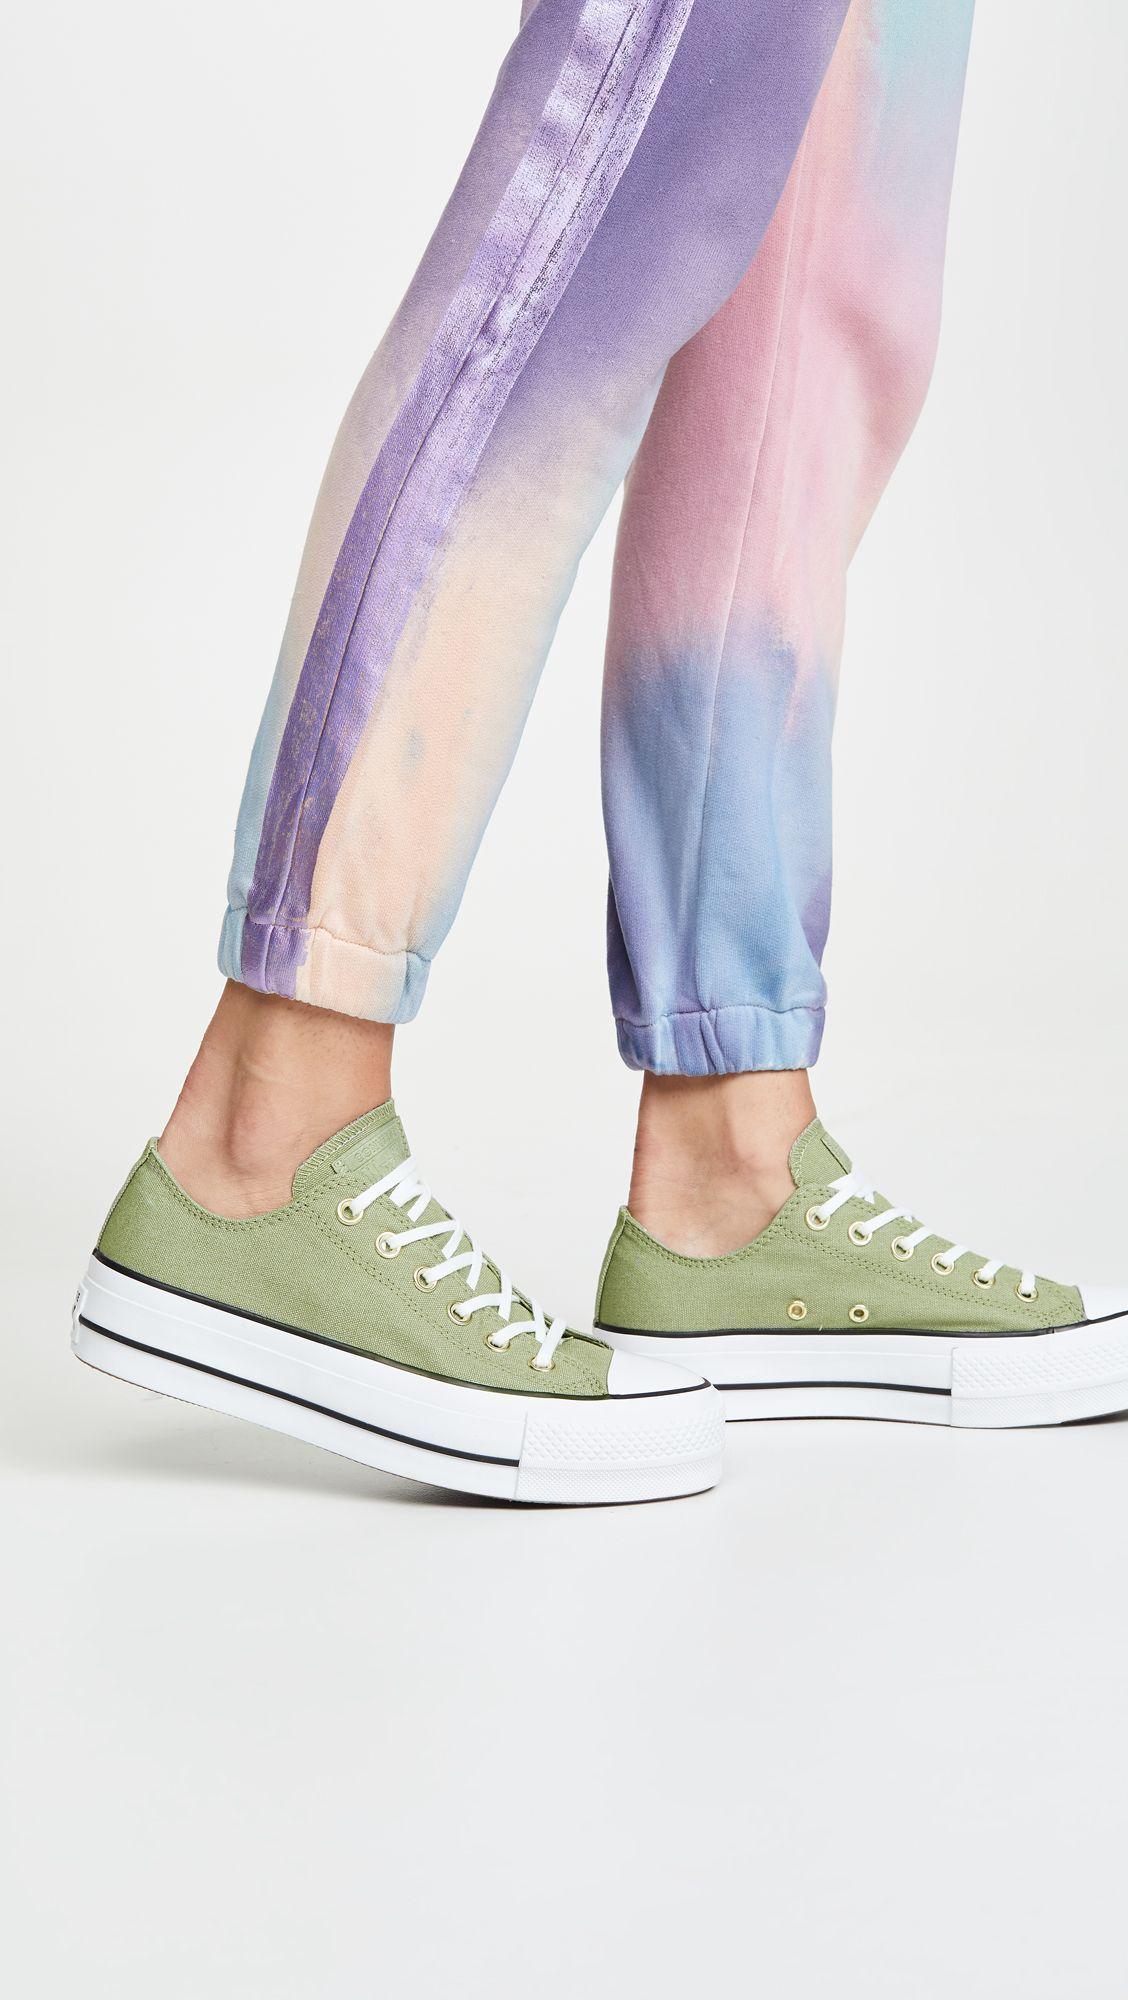 Chuck Taylor All Star Lift Ox Sneakers #chipandjoannagainescostume Converse Chuck Taylor All Star Lift Ox Sneakers #Sponsored , #spon, #Taylor, #Chuck, #Converse, #Star, #Sneakers #chipandjoannagainescostume Chuck Taylor All Star Lift Ox Sneakers #chipandjoannagainescostume Converse Chuck Taylor All Star Lift Ox Sneakers #Sponsored , #spon, #Taylor, #Chuck, #Converse, #Star, #Sneakers #chipandjoannagainescostume